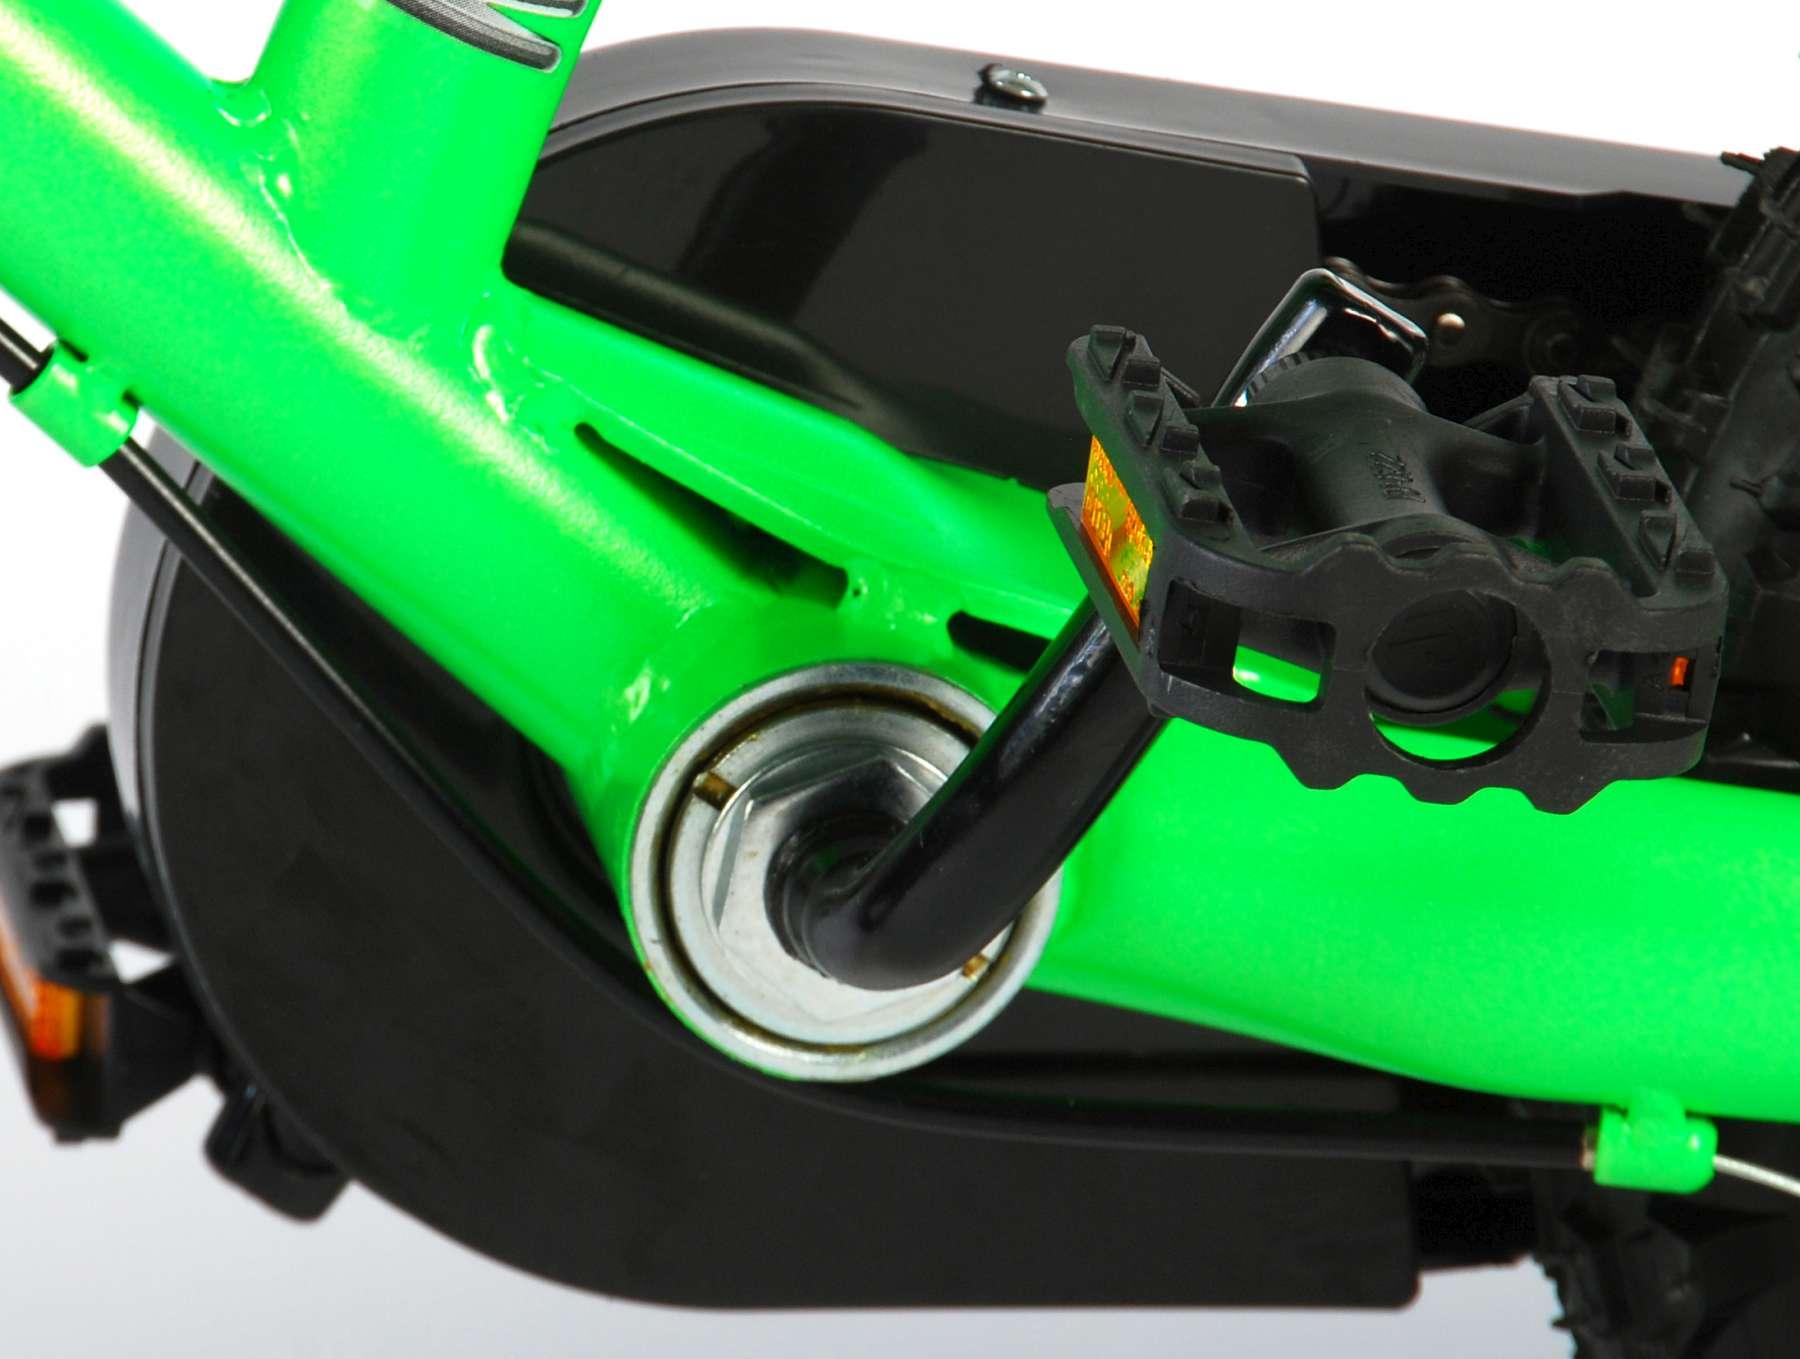 Bicicleta Motorbike de 12 pulgadas Verde - pedales